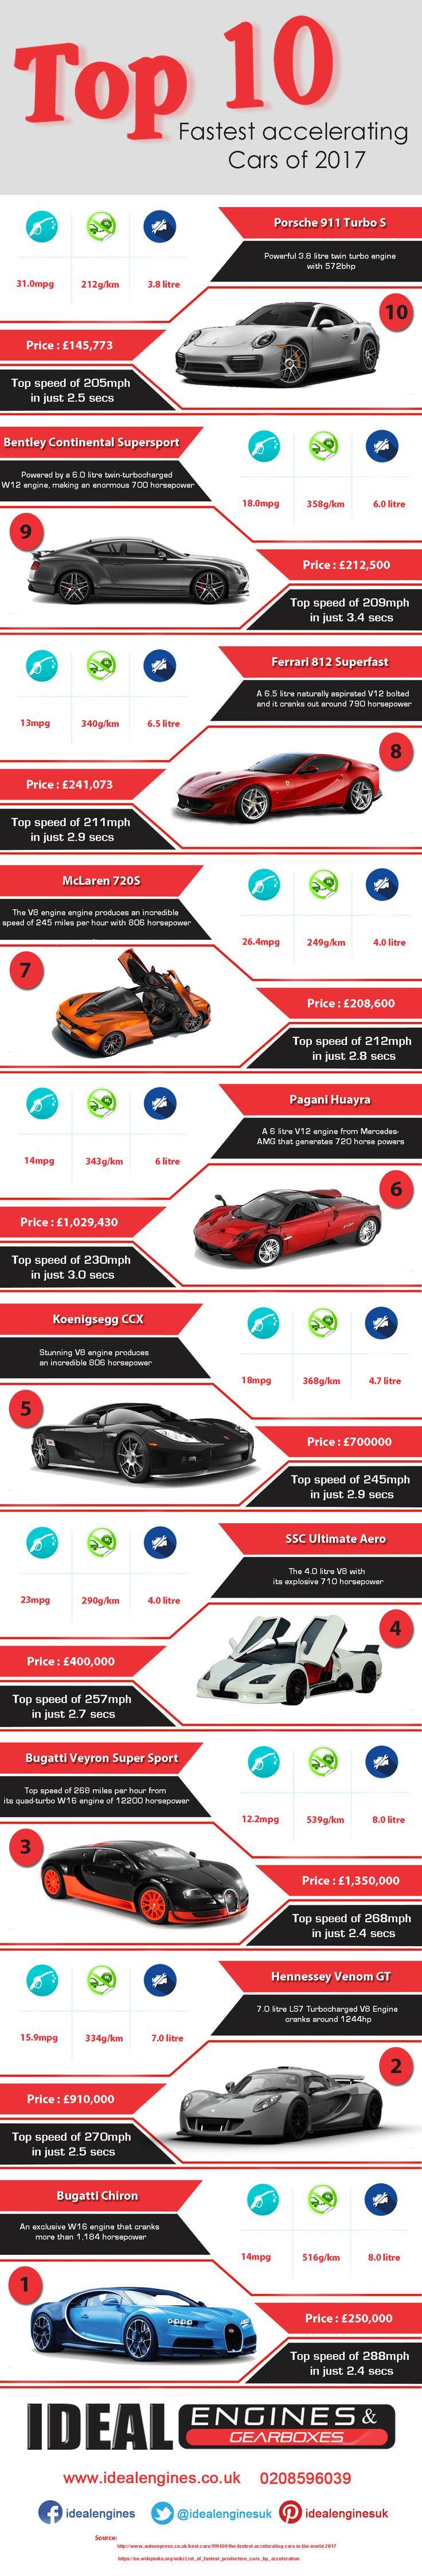 2352f6af83c51e41b15cdba0242e8364 Outstanding Bugatti Veyron Price In Kolkata Cars Trend